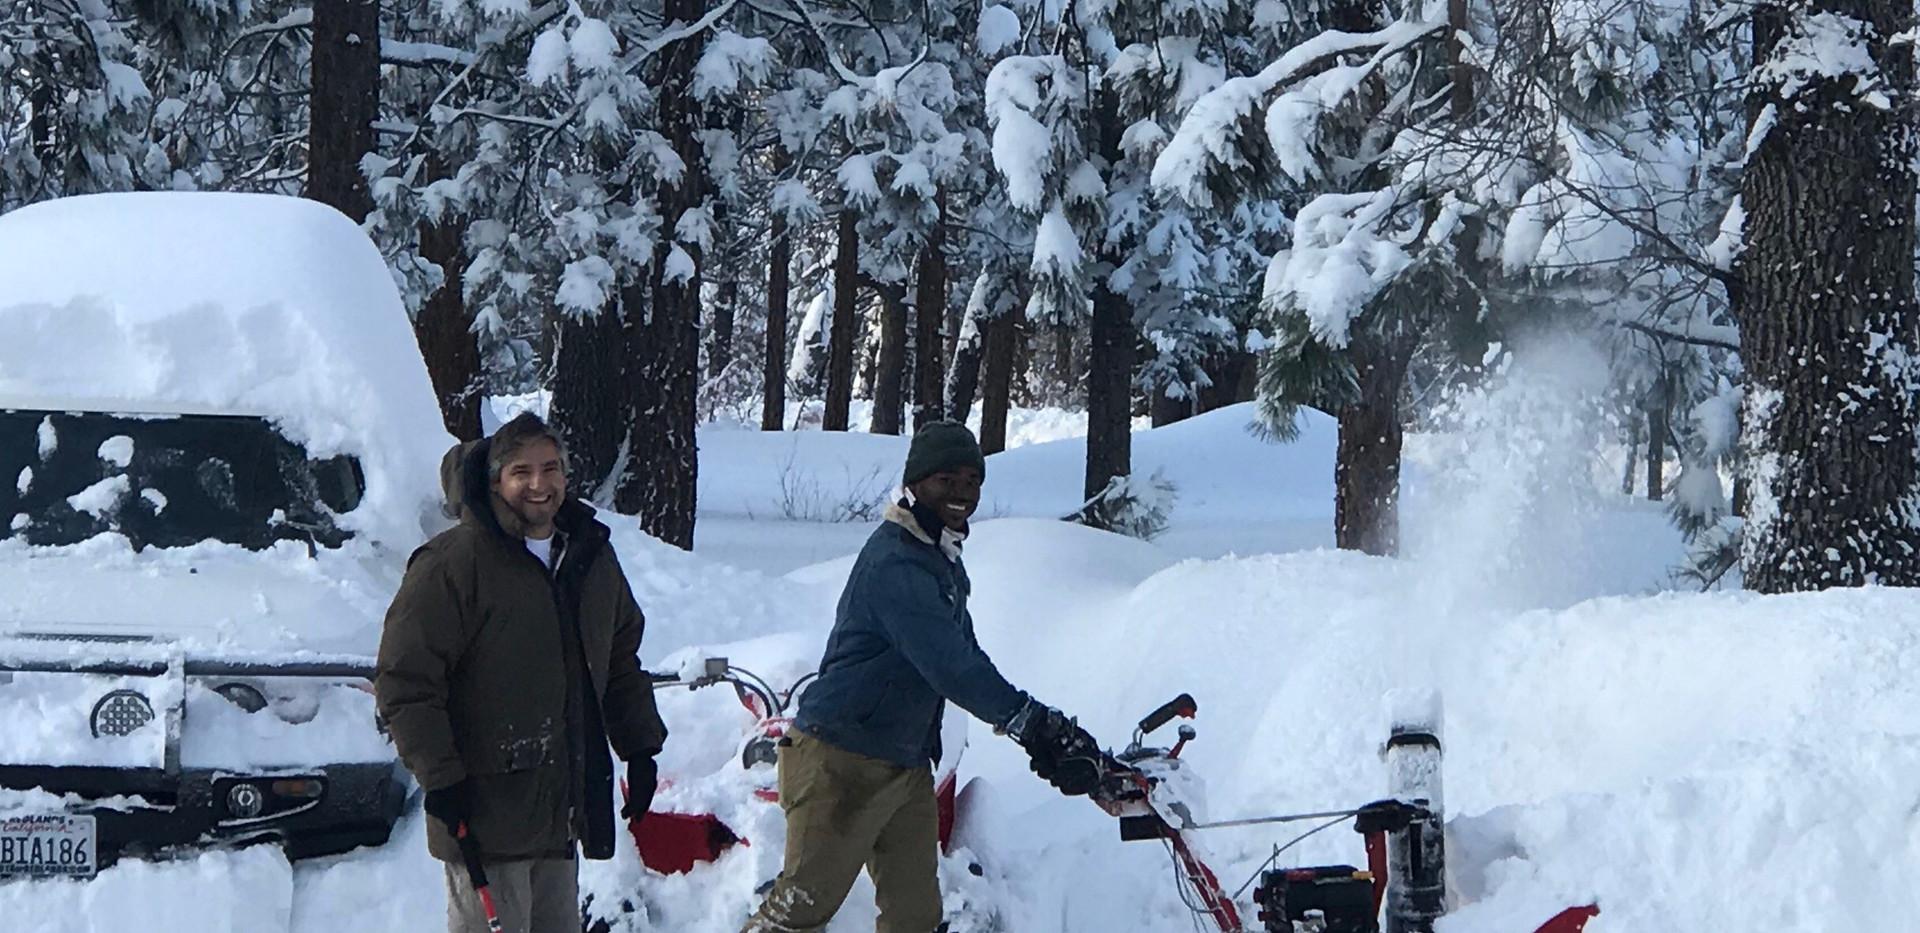 mile high pines snow